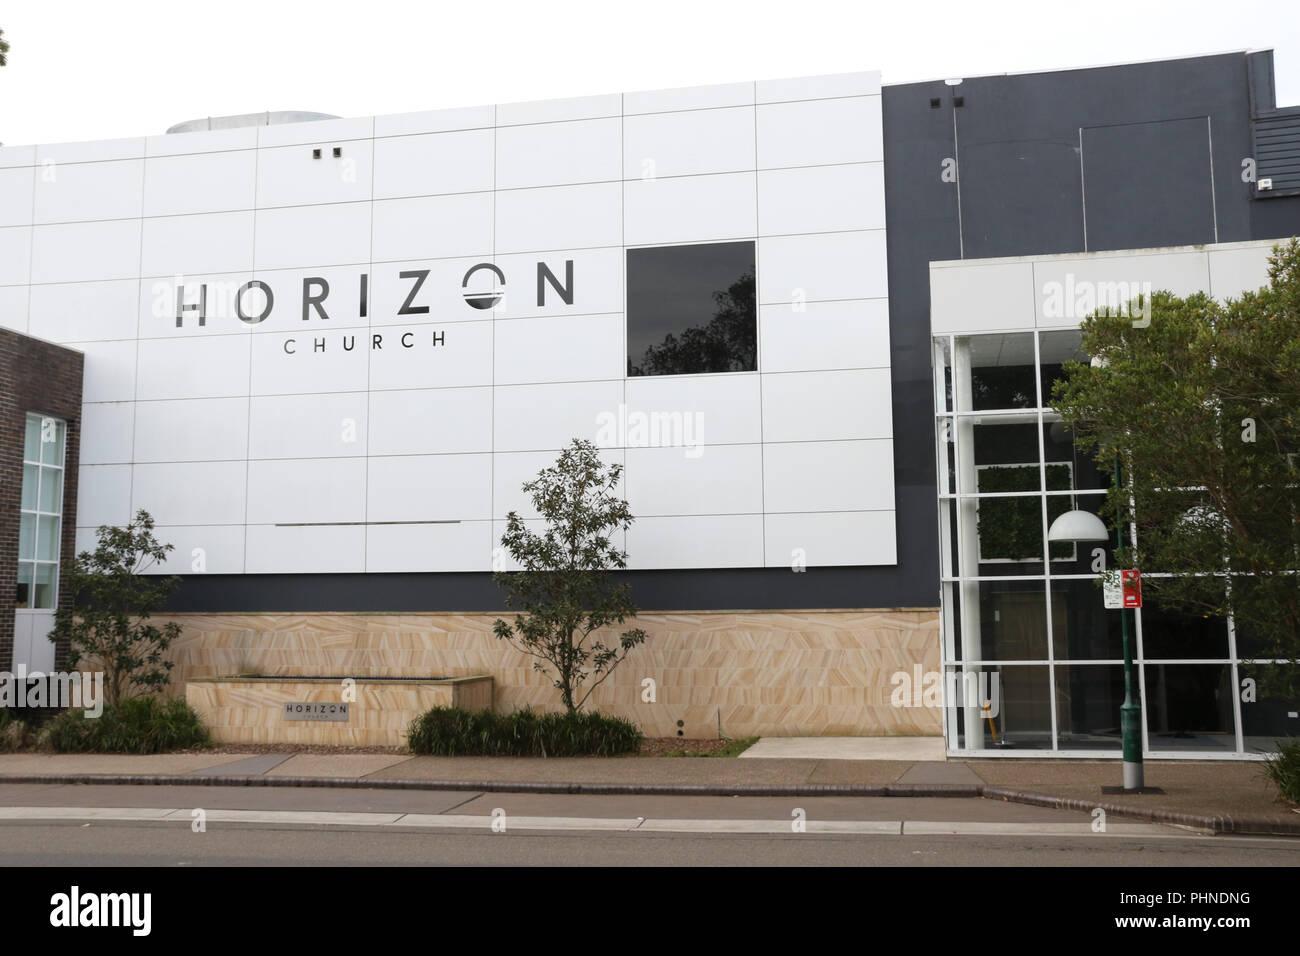 Horizon Church, a Pentecostal Christian church affiliated with Australian Christian Churches, the Australian branch of the Assemblies of God denominat - Stock Image